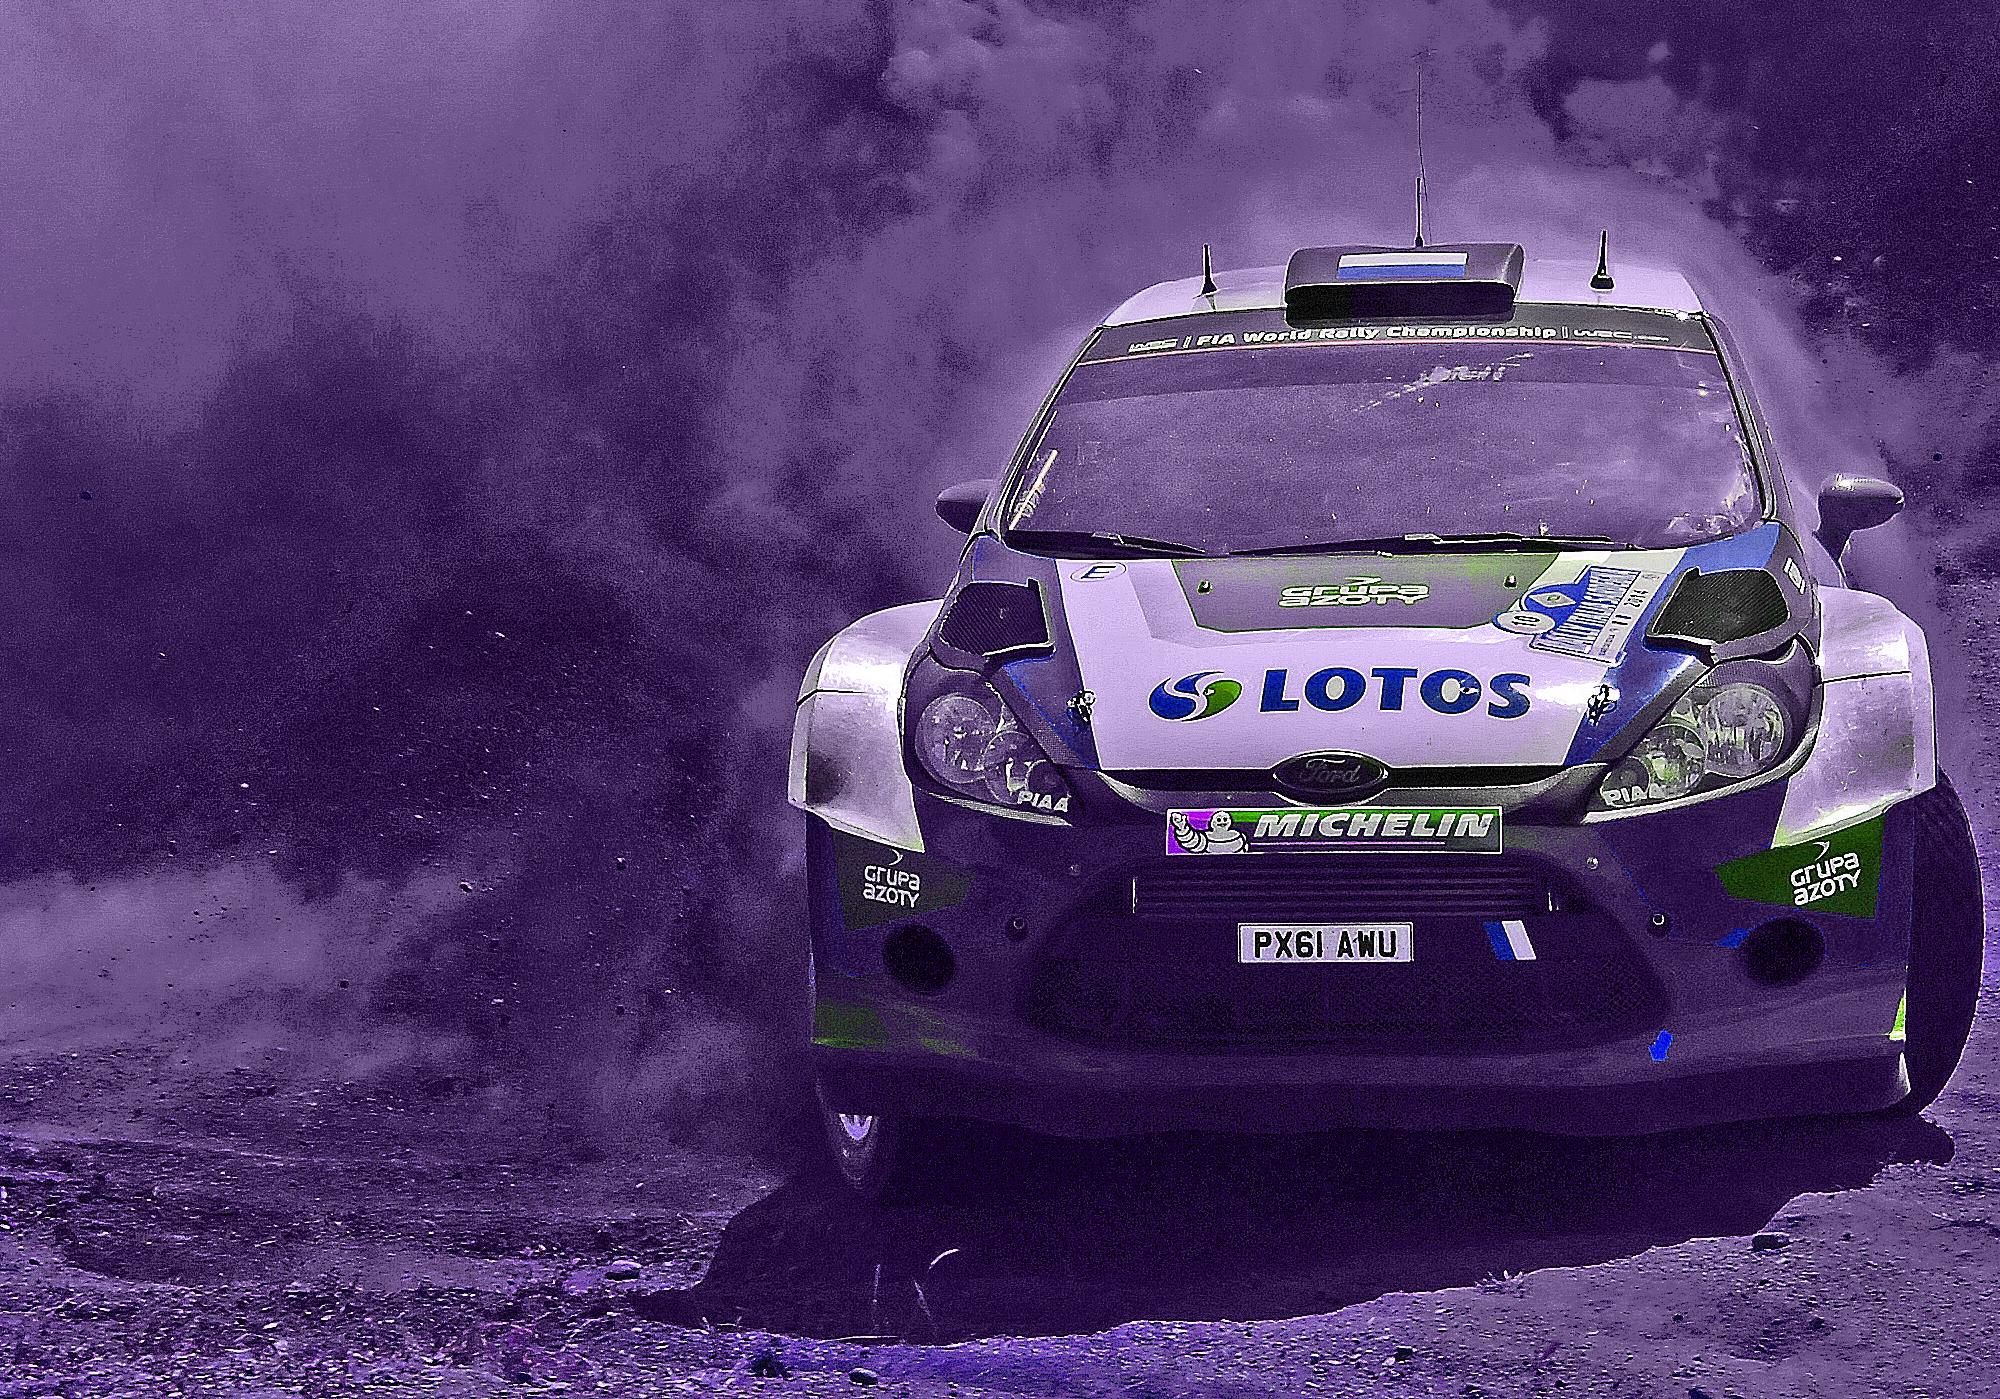 Rally car covered in sponsor logos